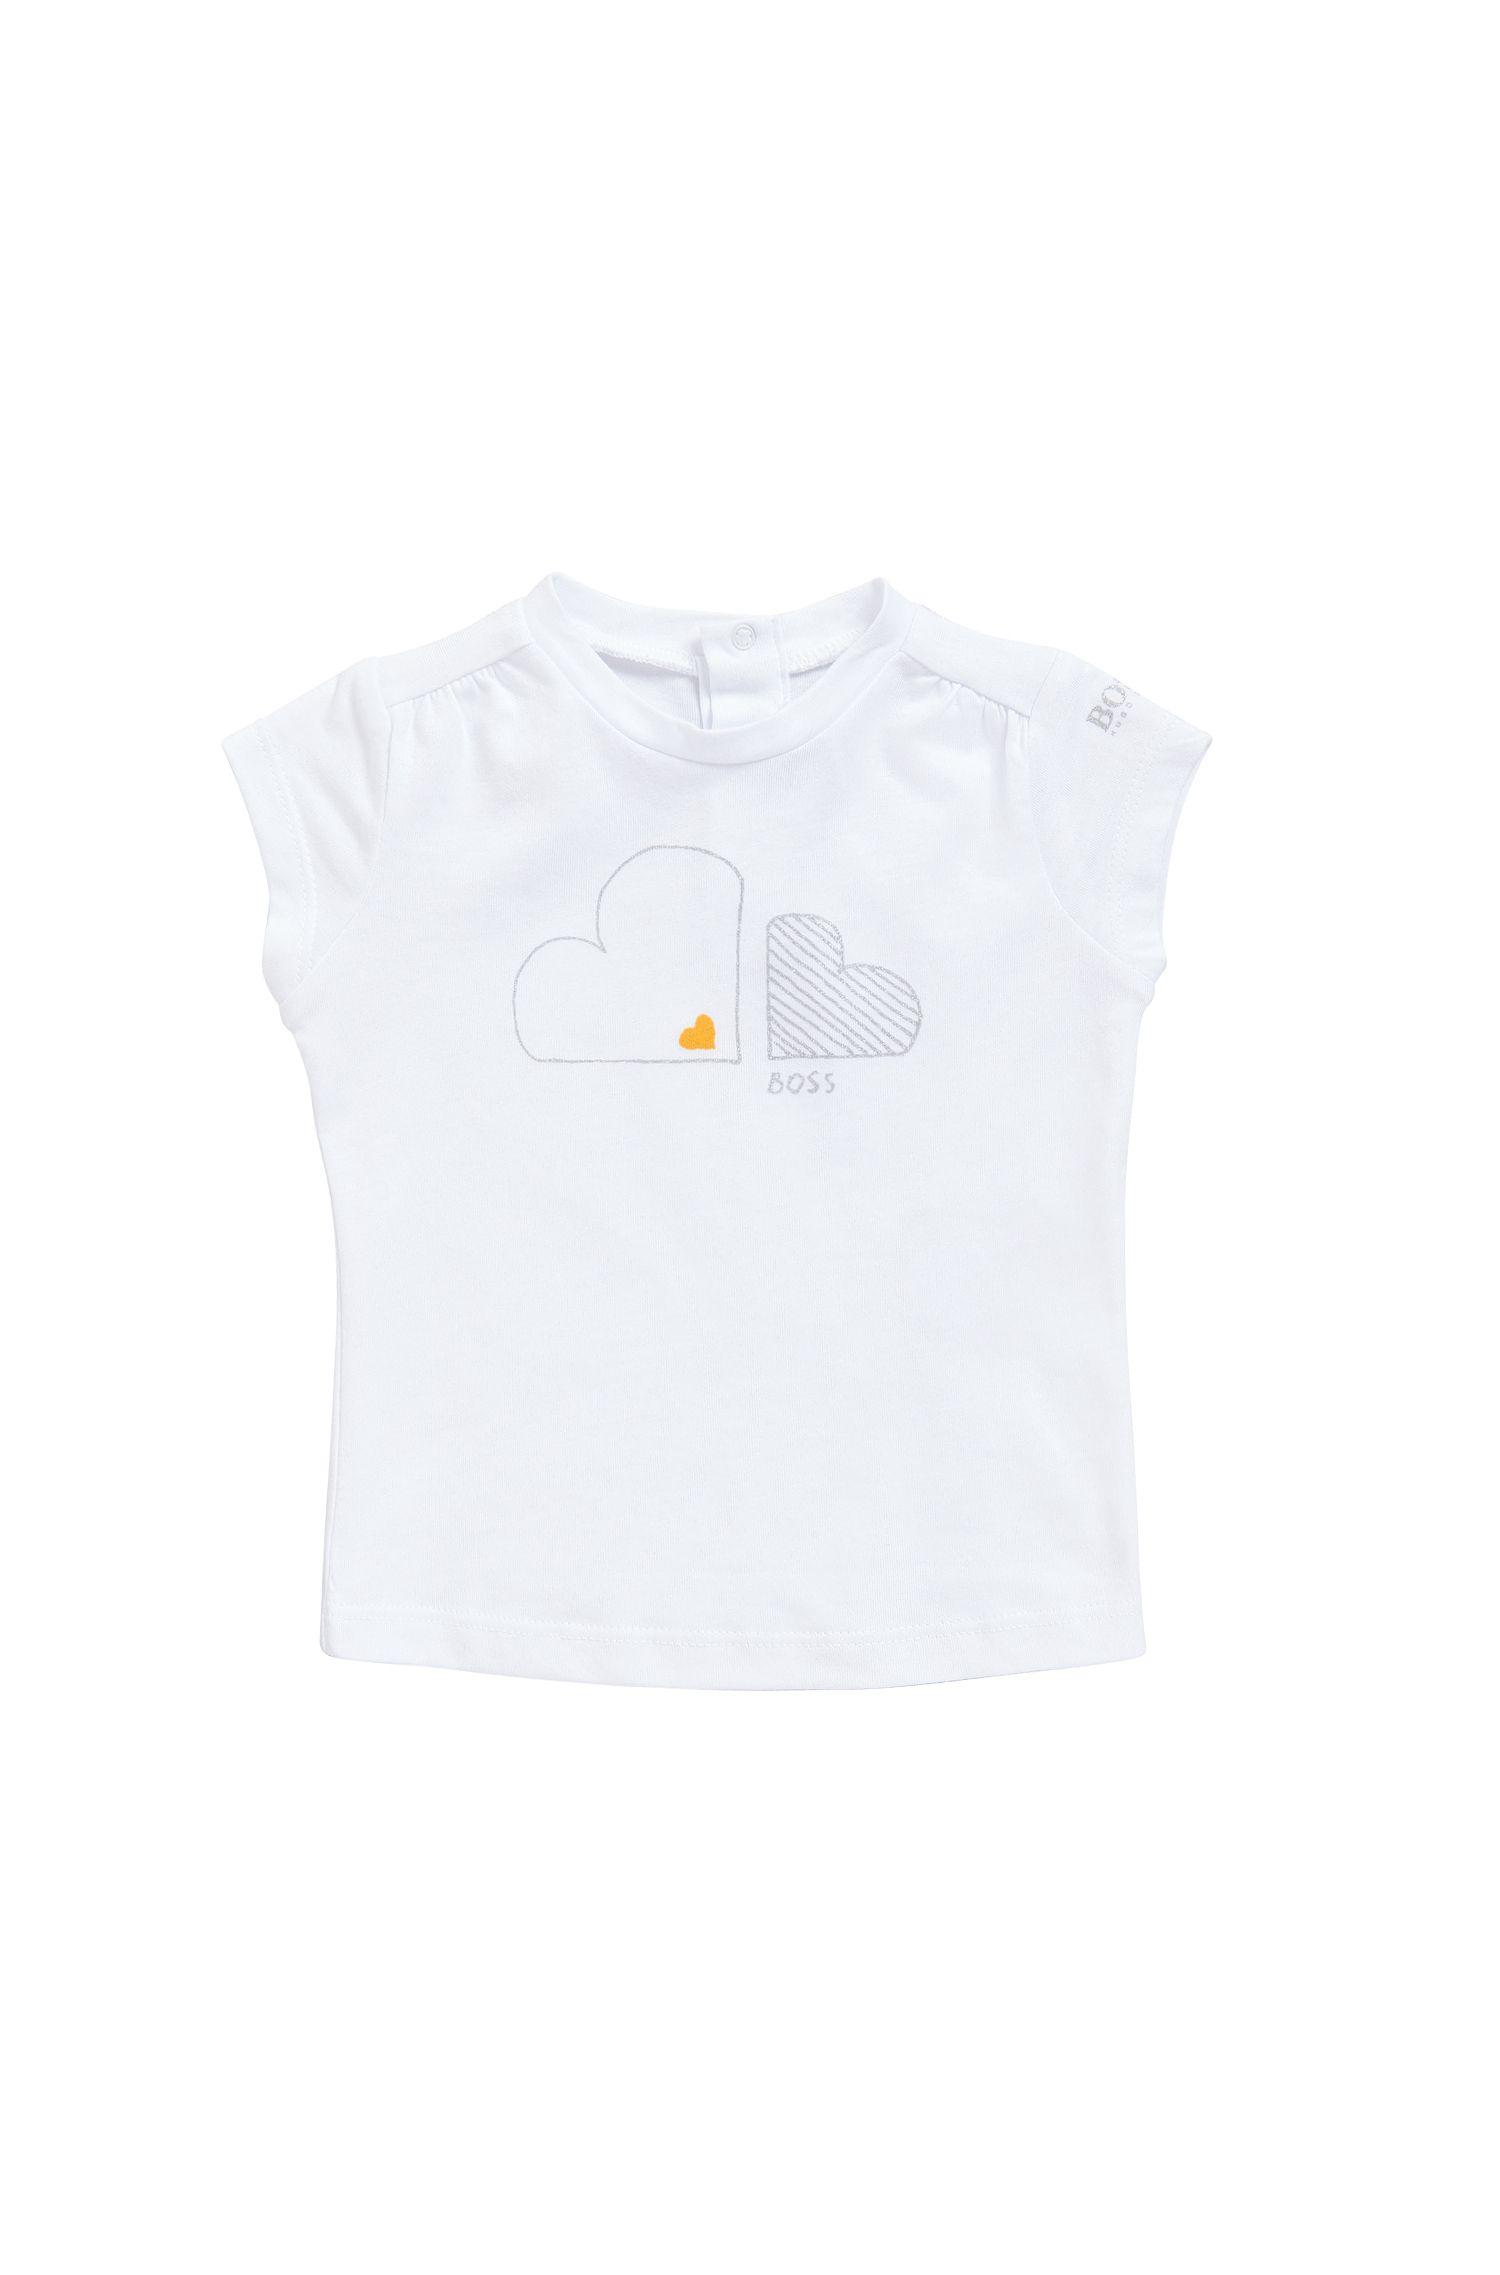 Baby-T-Shirt aus Baumwoll-Modal-Mix mit Glitzer-Print: 'J05474'